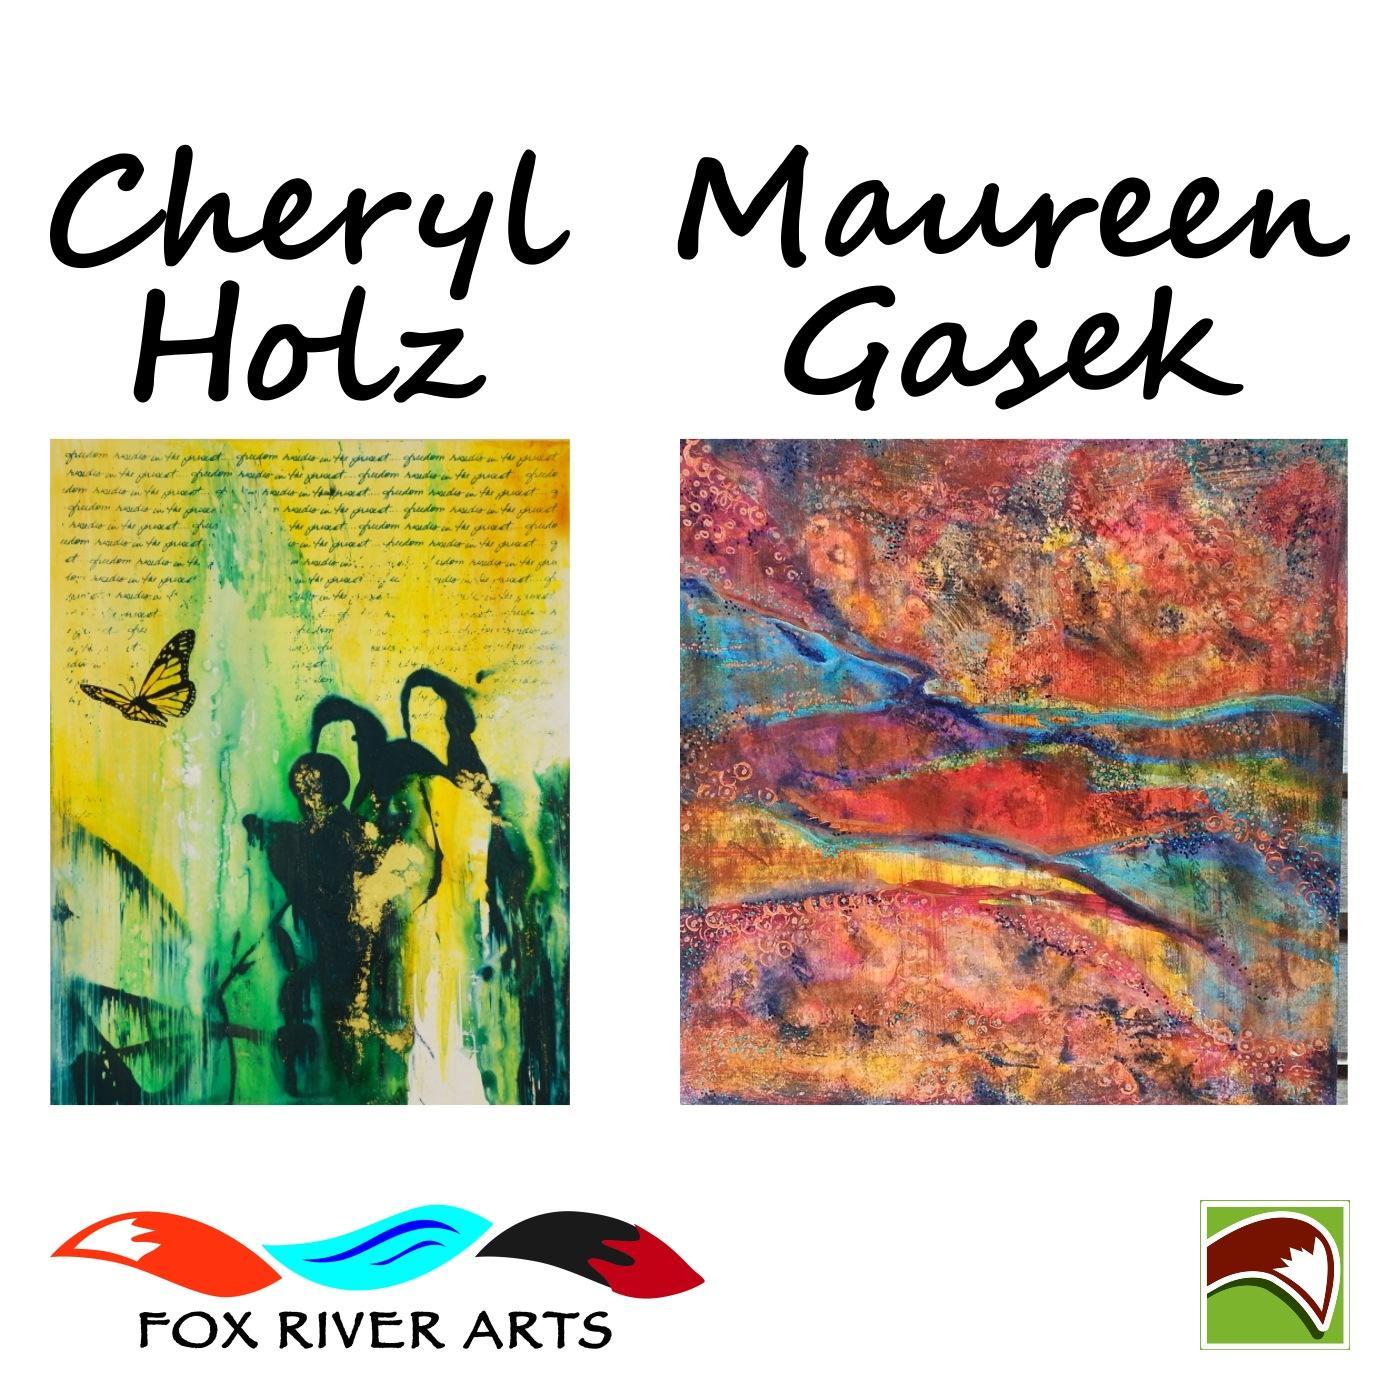 Artwork for Cheryl Holz and Maureen Gasek